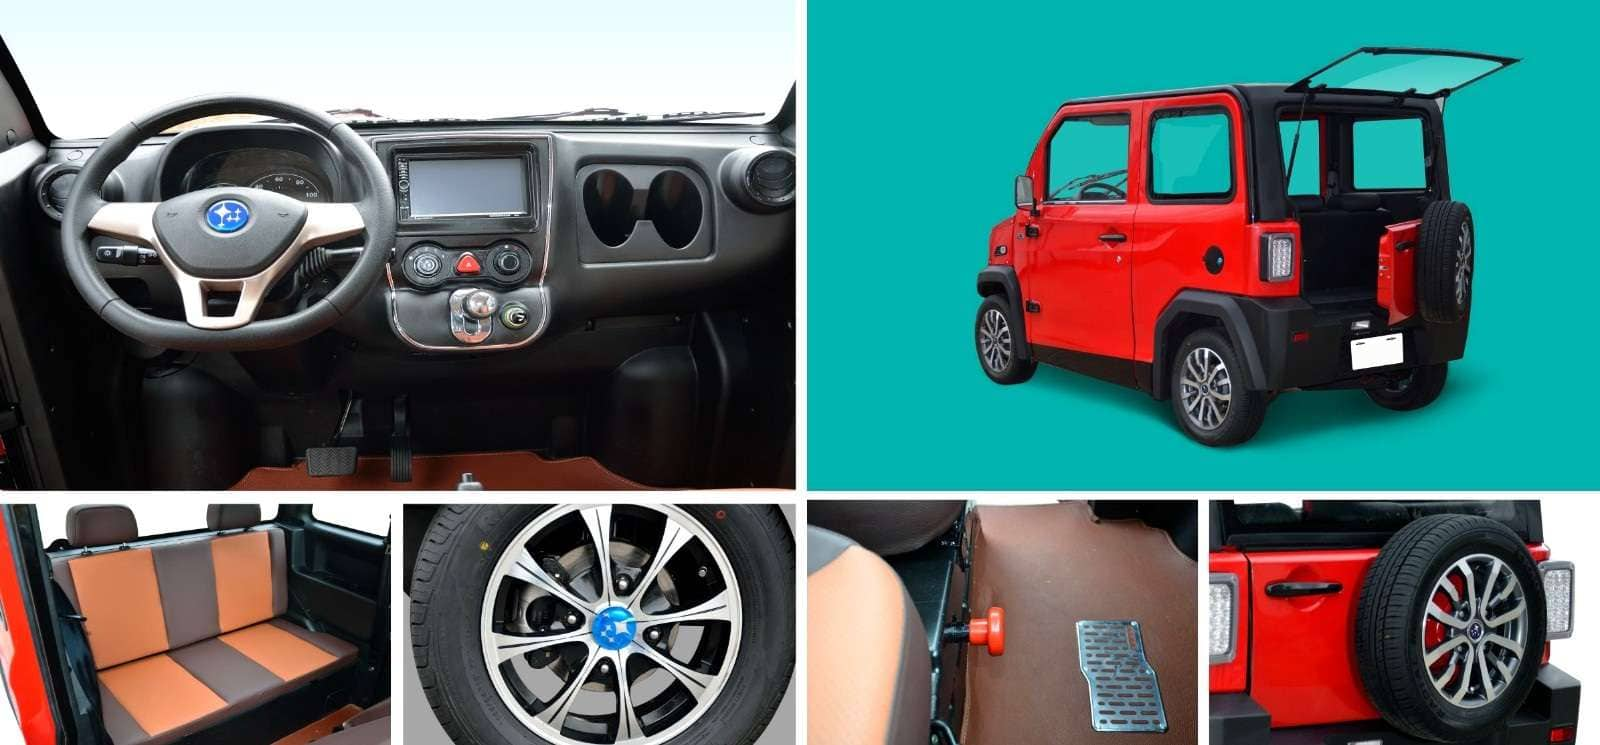 Maxi Sport Sedan and Suv collage interior and exterior